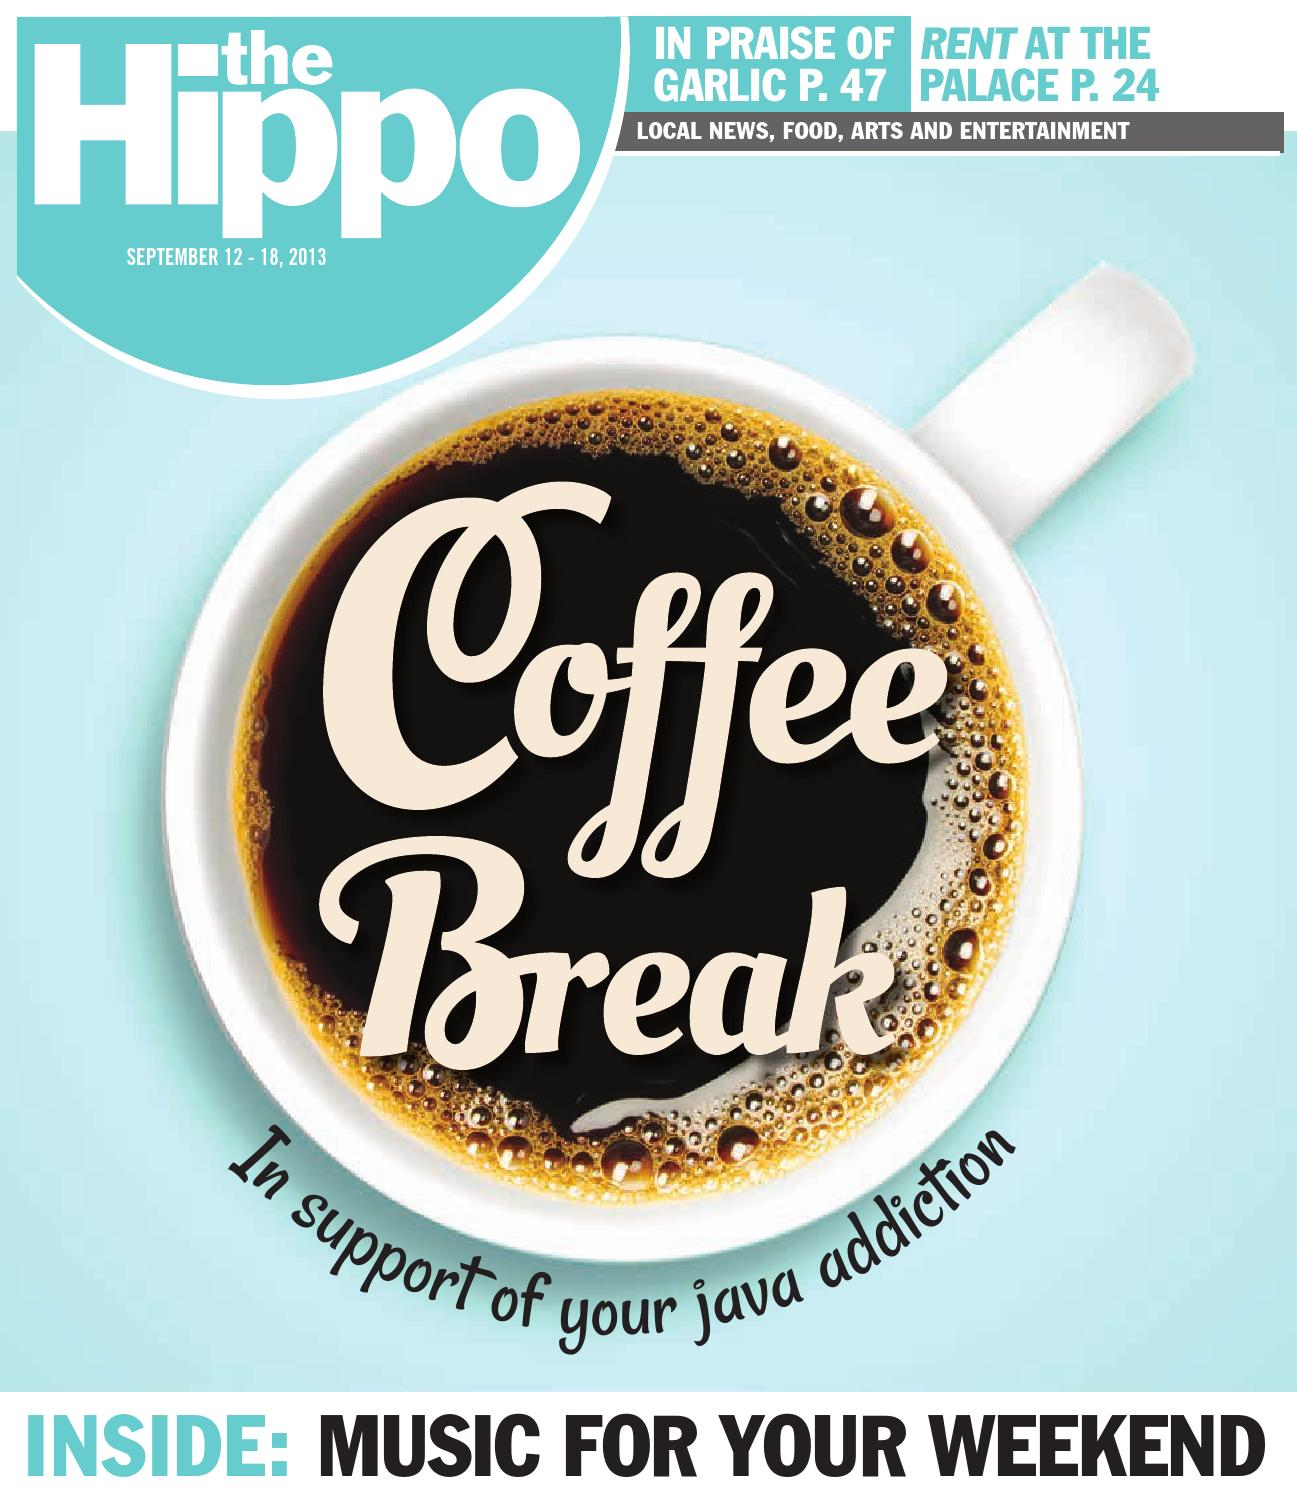 e4c1761ba3c Hippo 09 11 13 by The Hippo - issuu